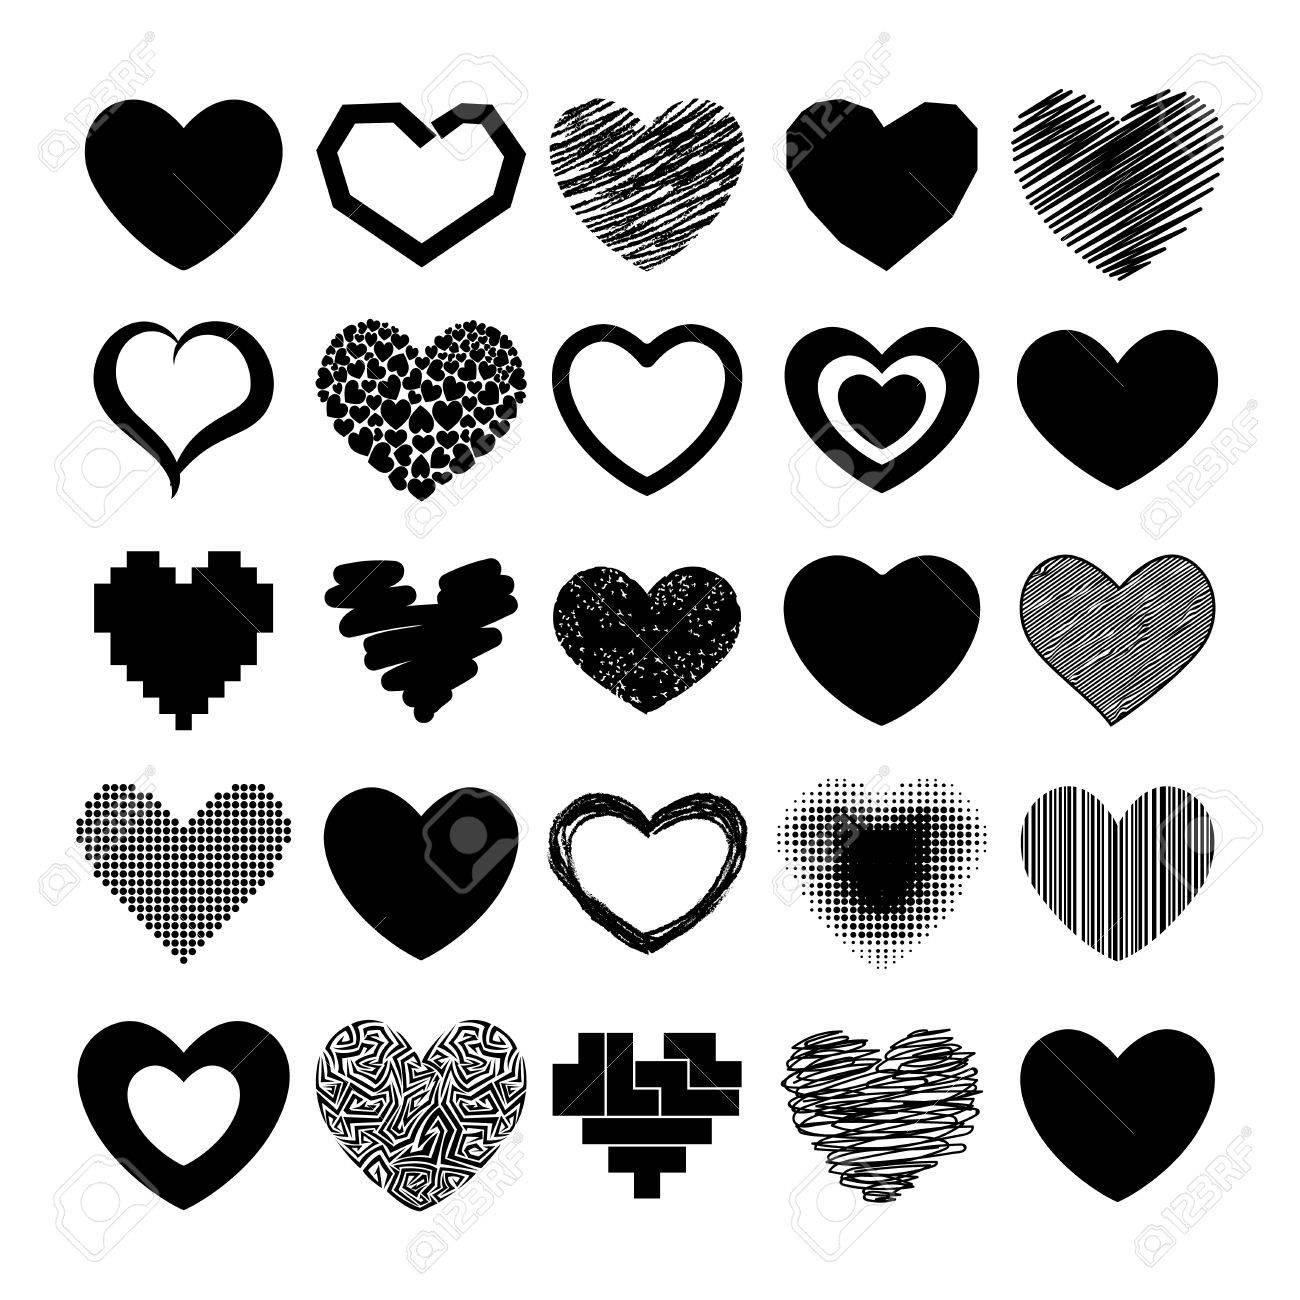 Simple red hearts sharp vector icon color card beautiful simple red hearts sharp vector icon color card beautiful celebrate bright emoticon red heart symbols biocorpaavc